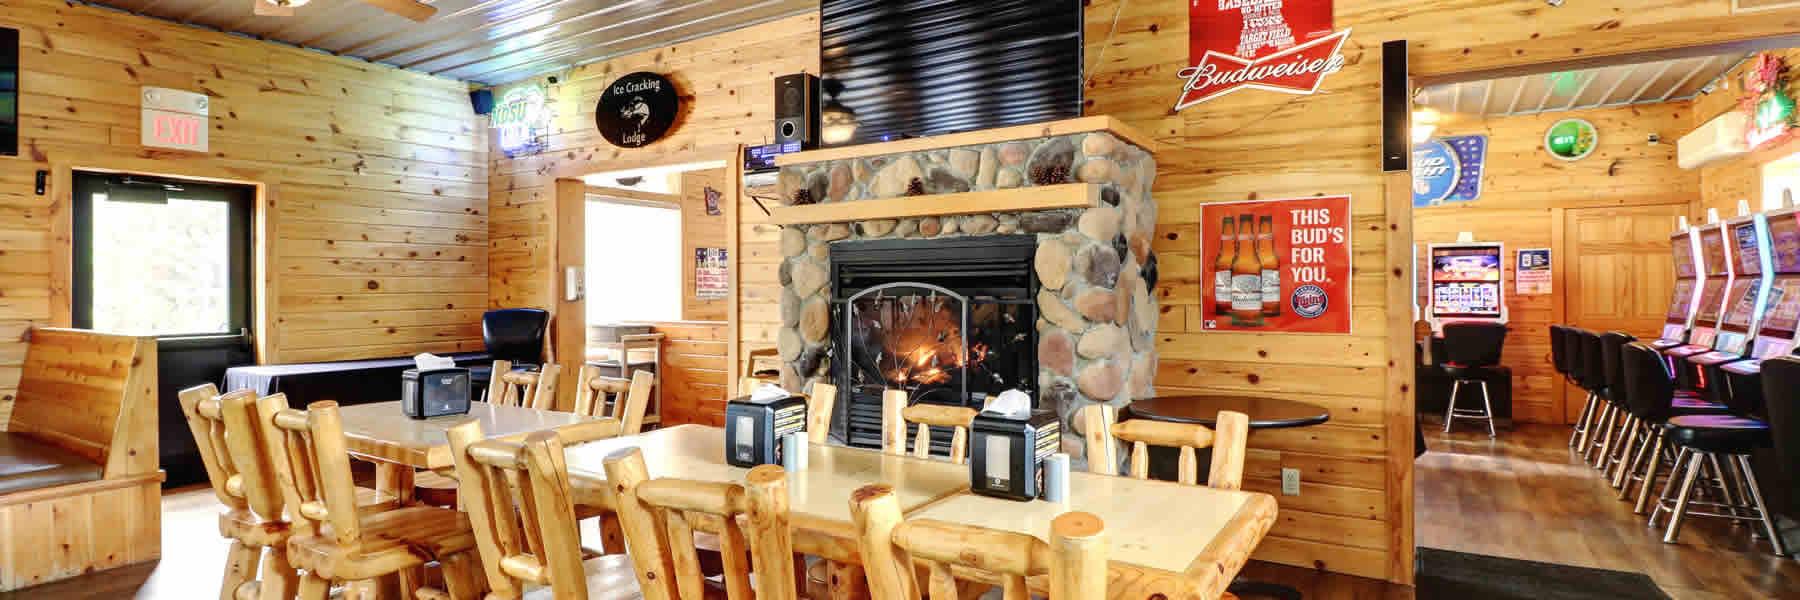 Enjoy great Prime Rib at the Ice Cracking Lodge.